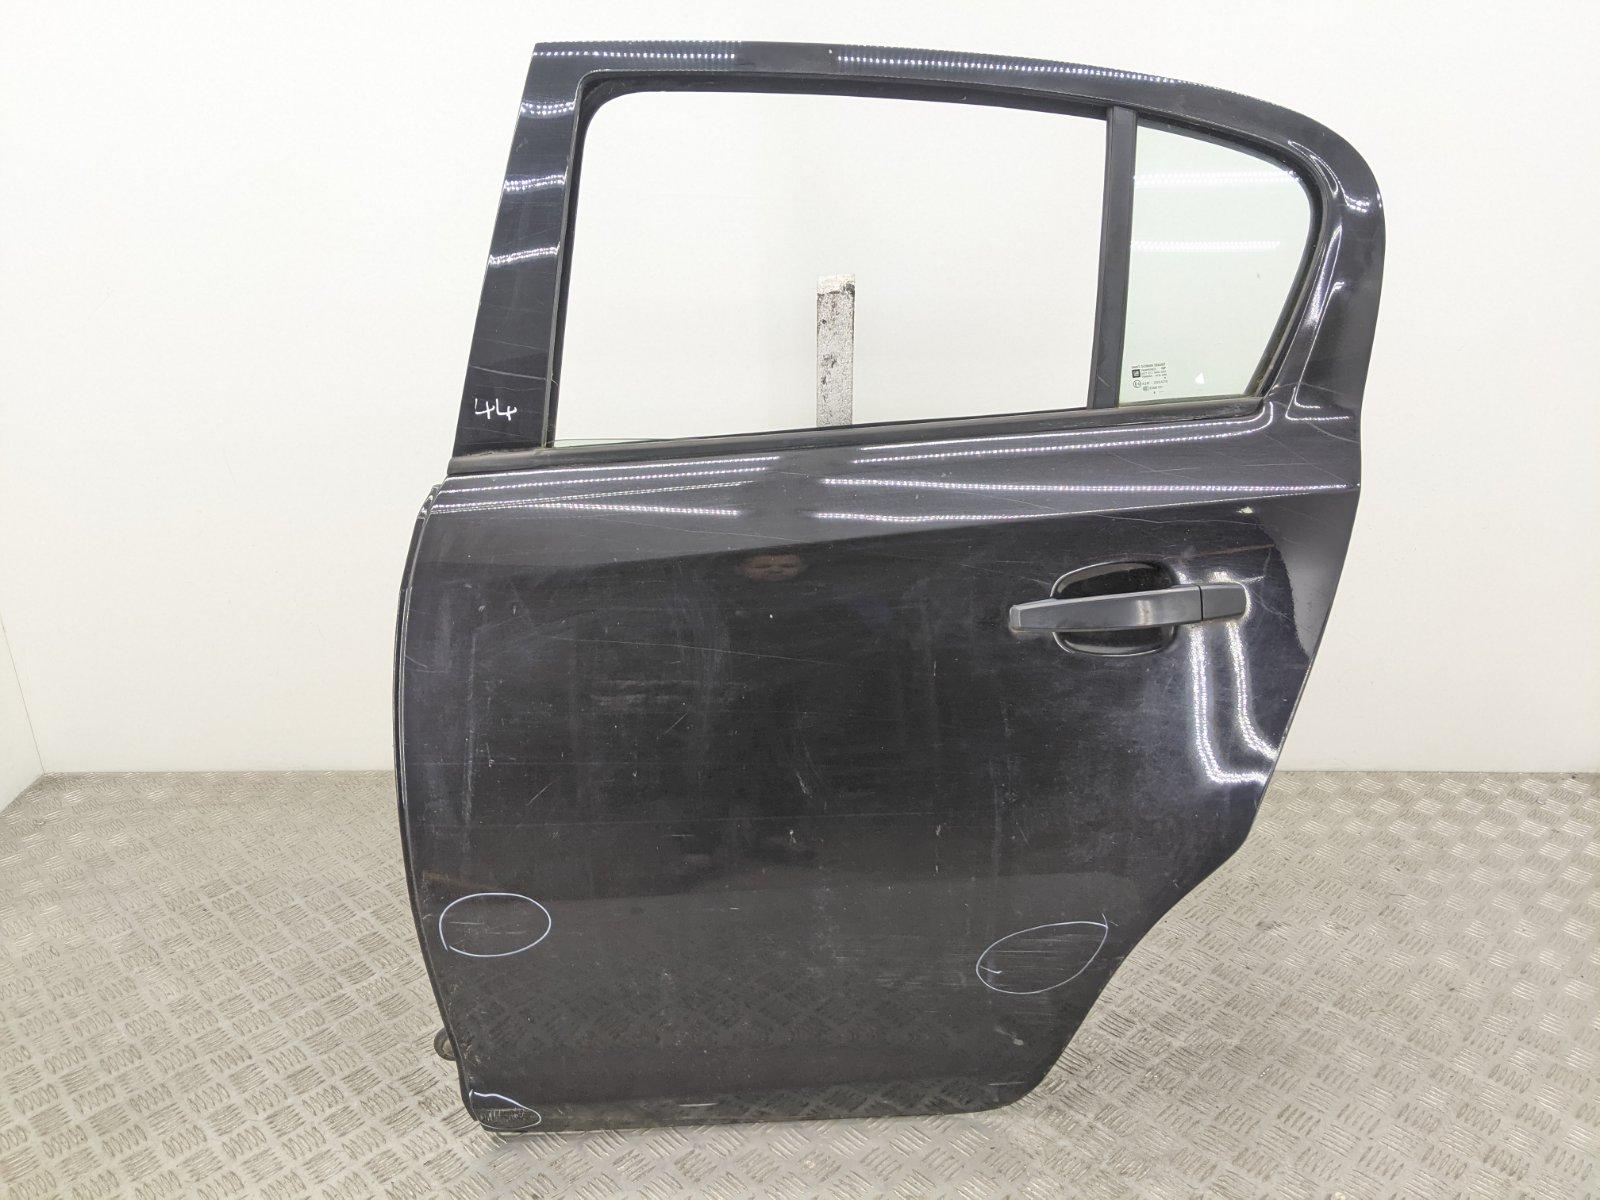 Дверь задняя левая Opel Corsa D 1.2 I 2008 (б/у)